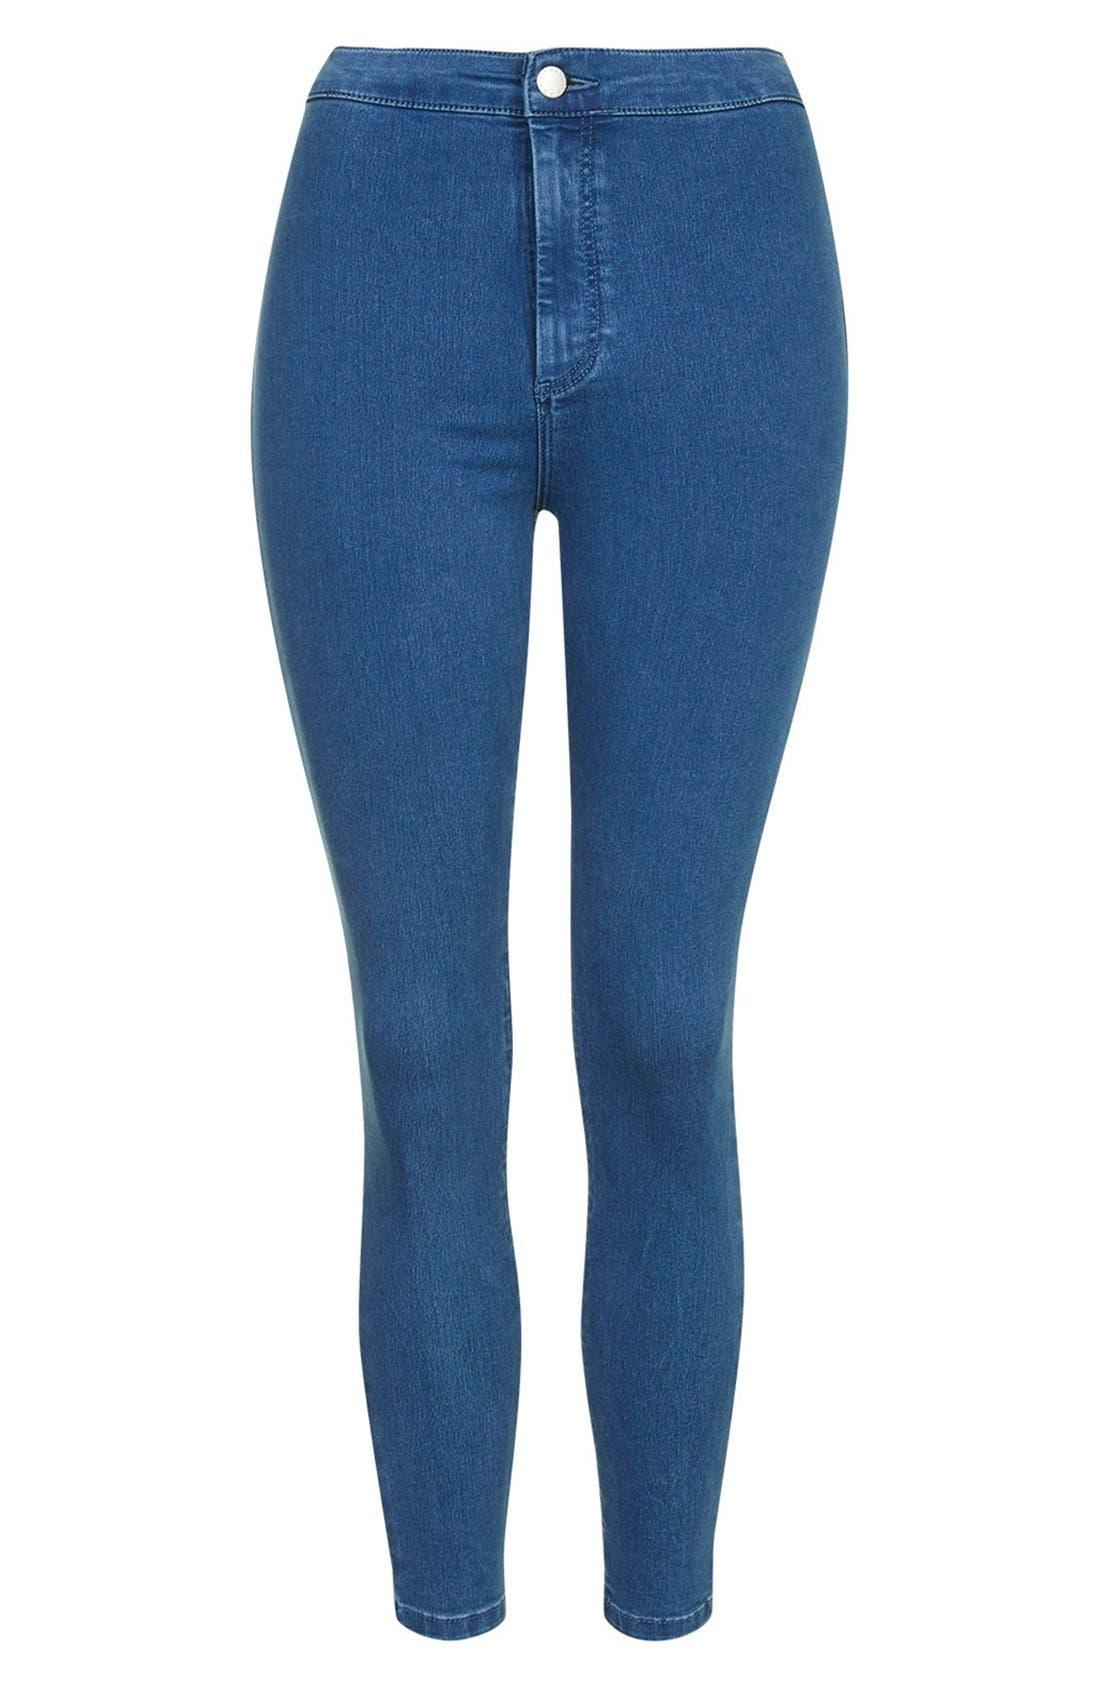 Alternate Image 4  - Topshop Moto 'Joni' High Rise Super Skinny Jeans (Mid Denim) (Petite)